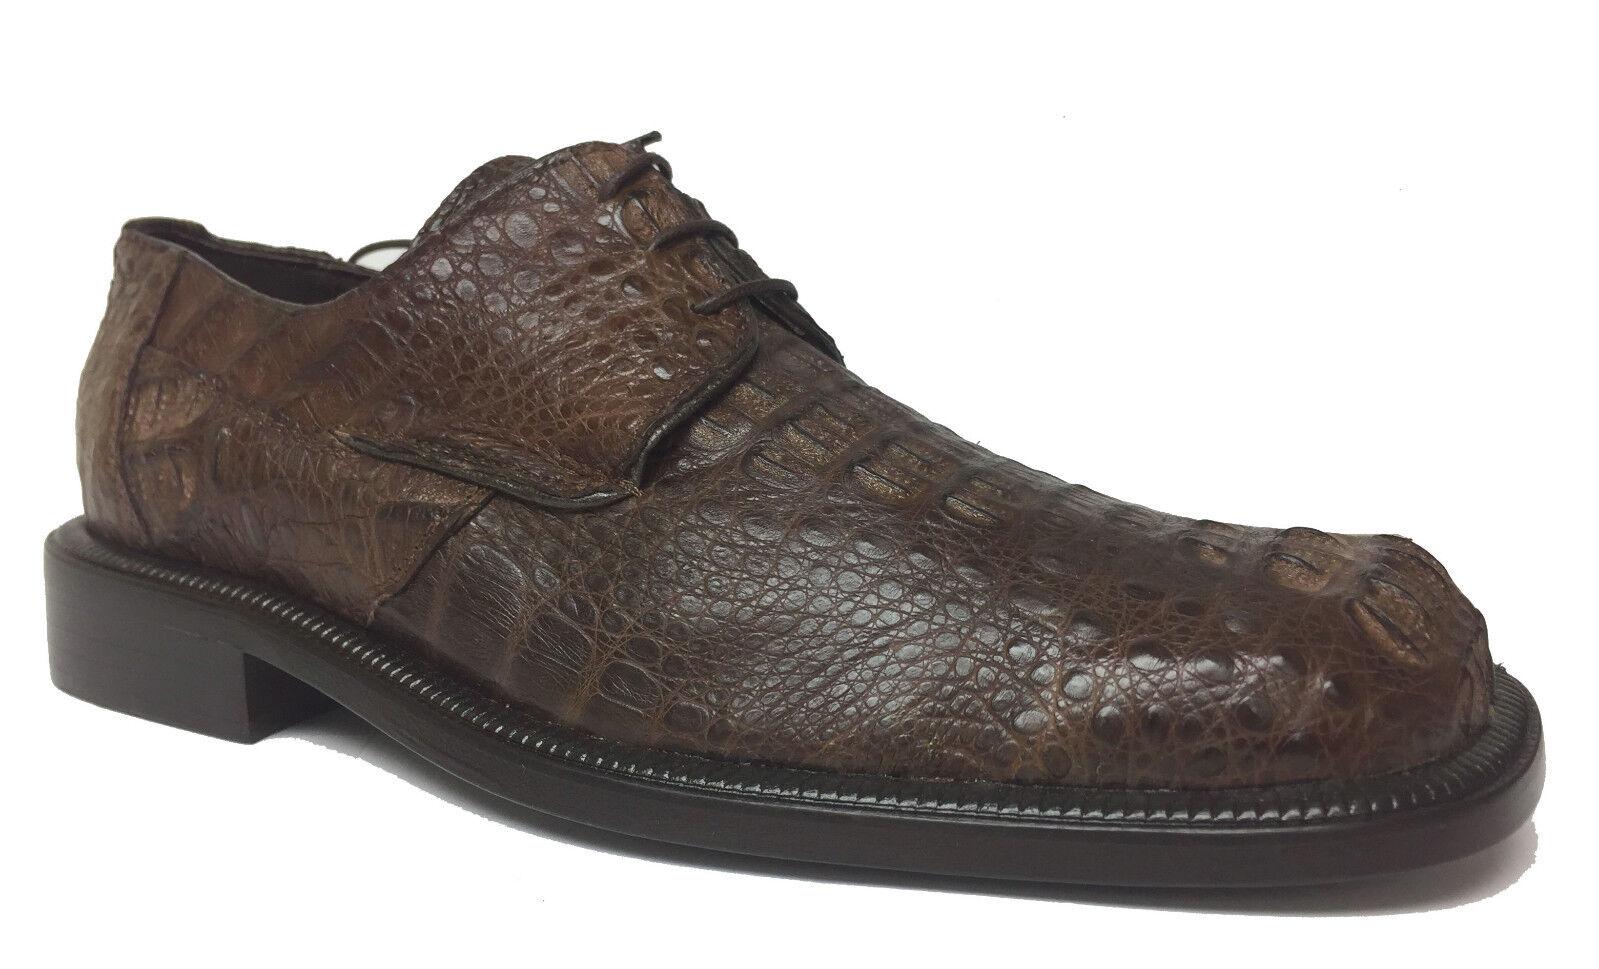 New Uomo Chocolate marrone Genuine Crocodile Alligator Dress Scarpe Fashion Oxford